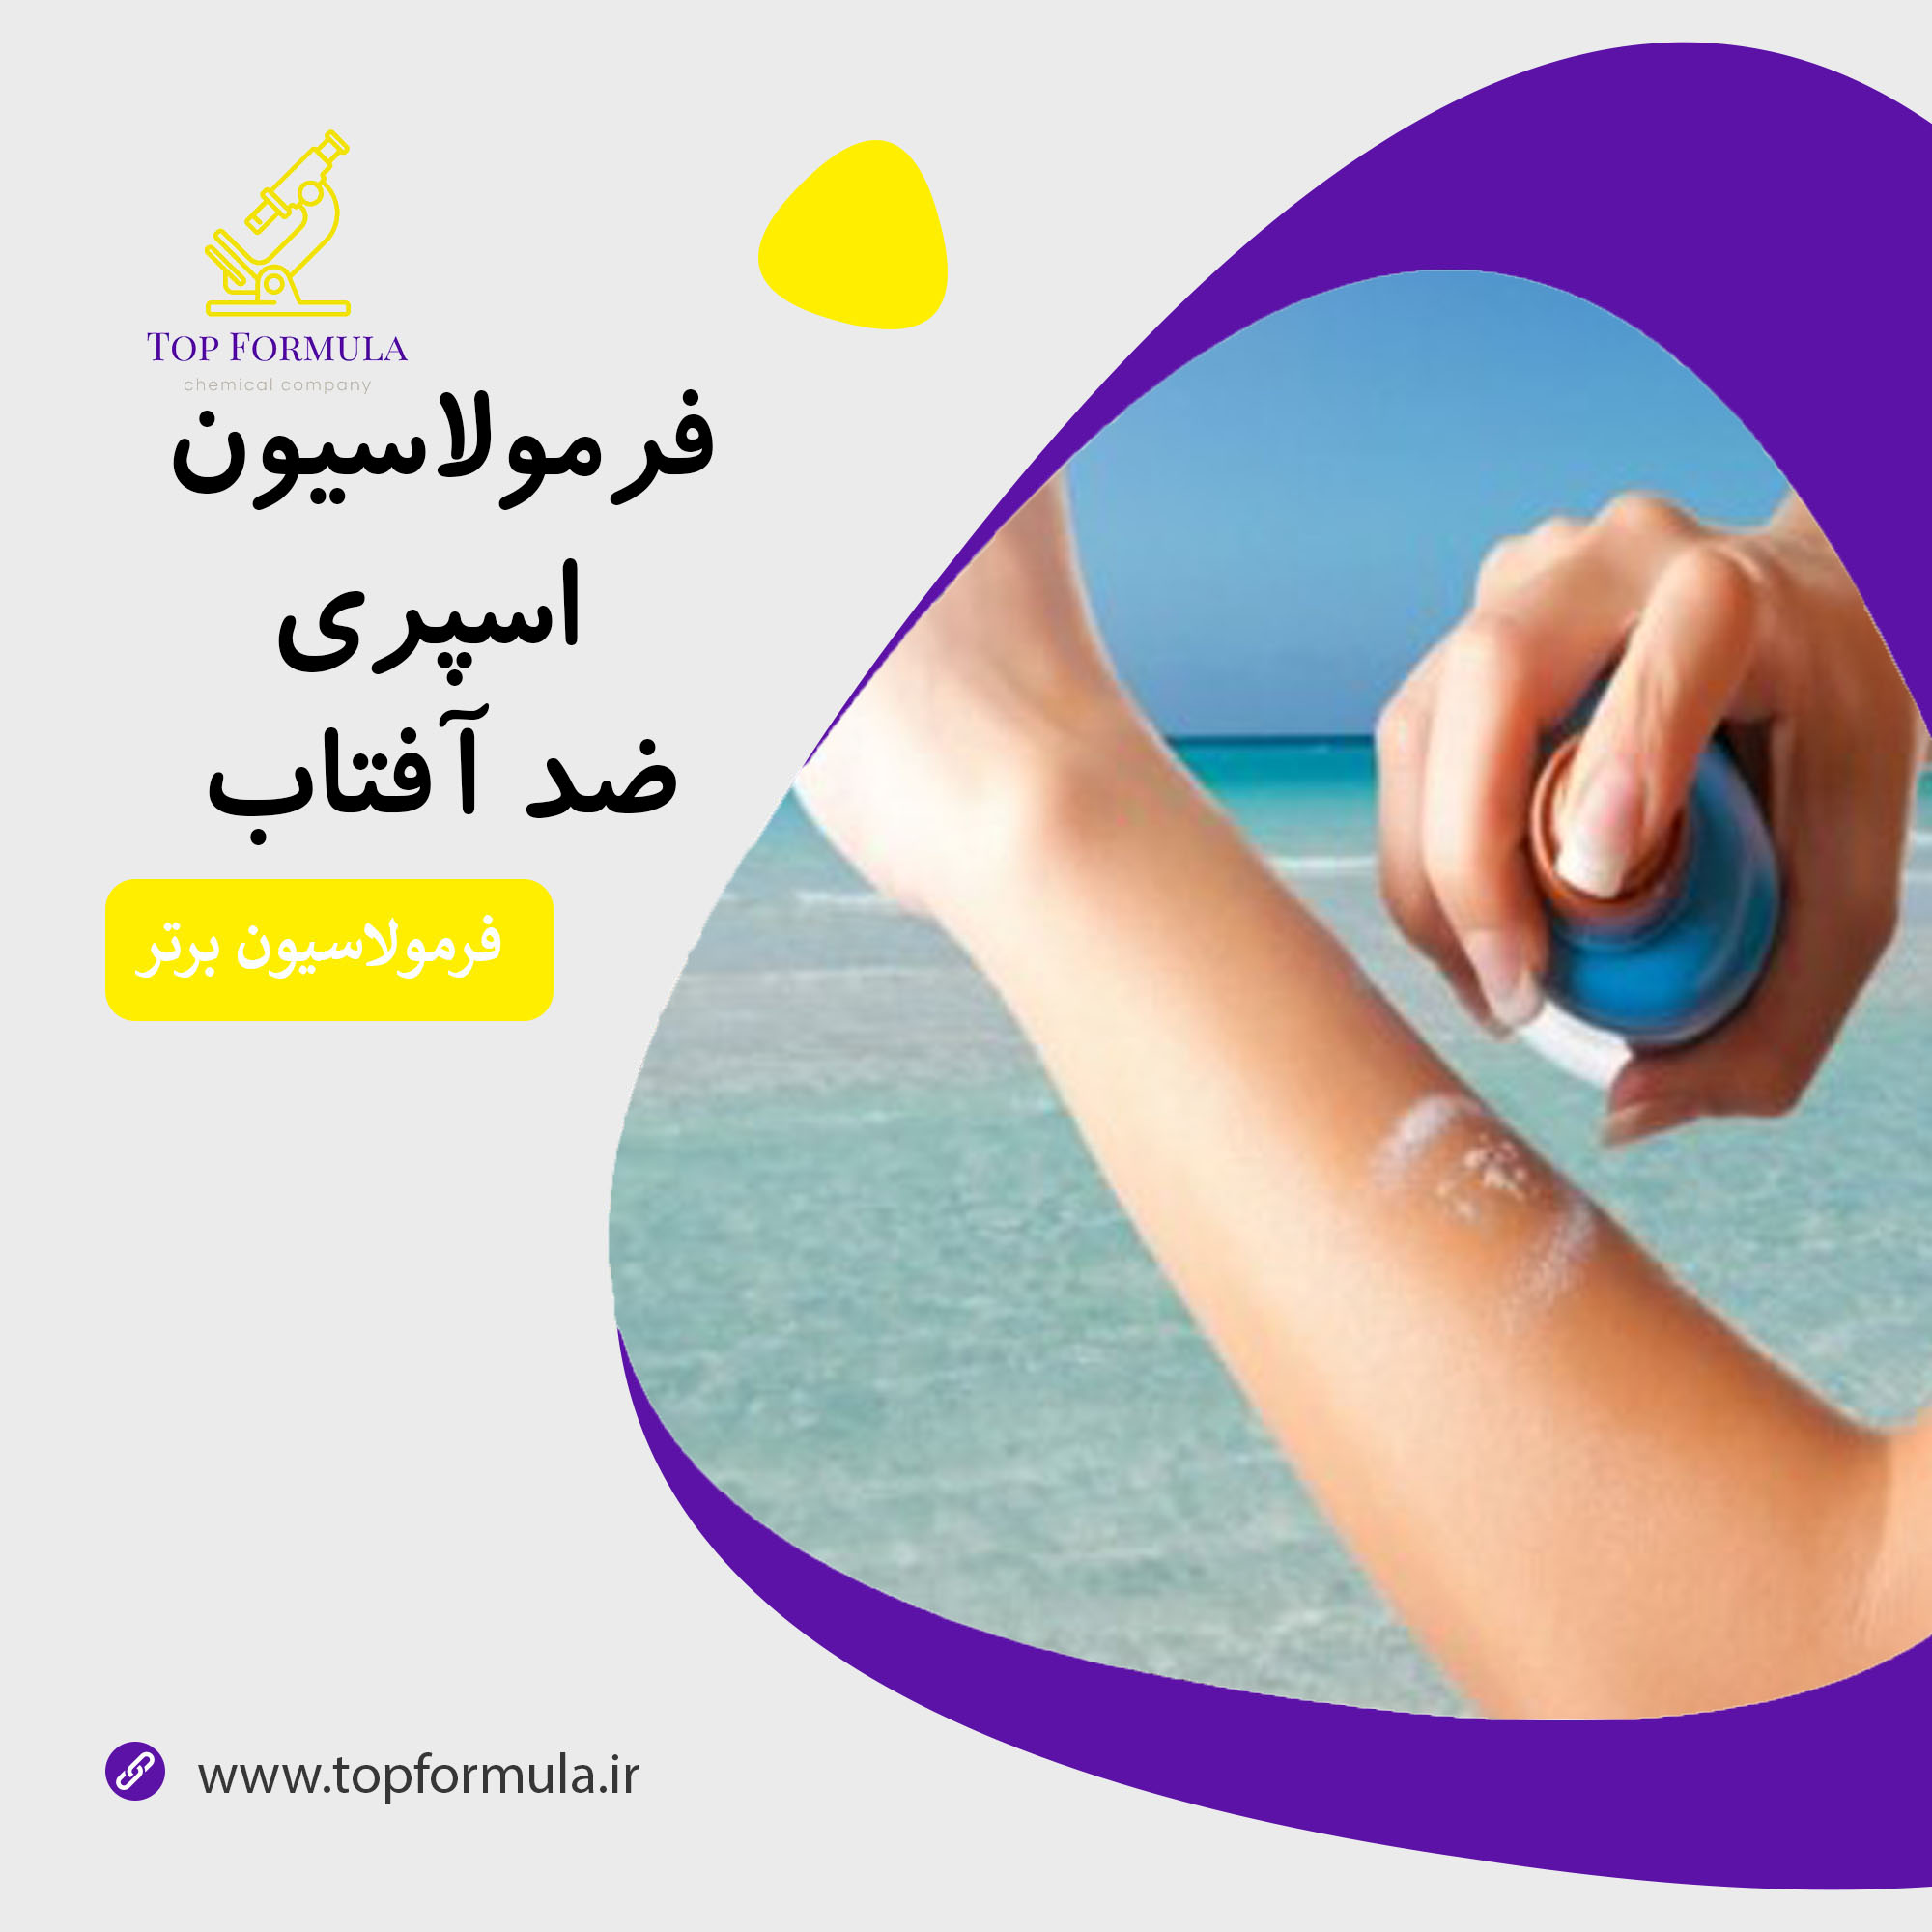 فرمولاسیون اسپری ضد آفتاب